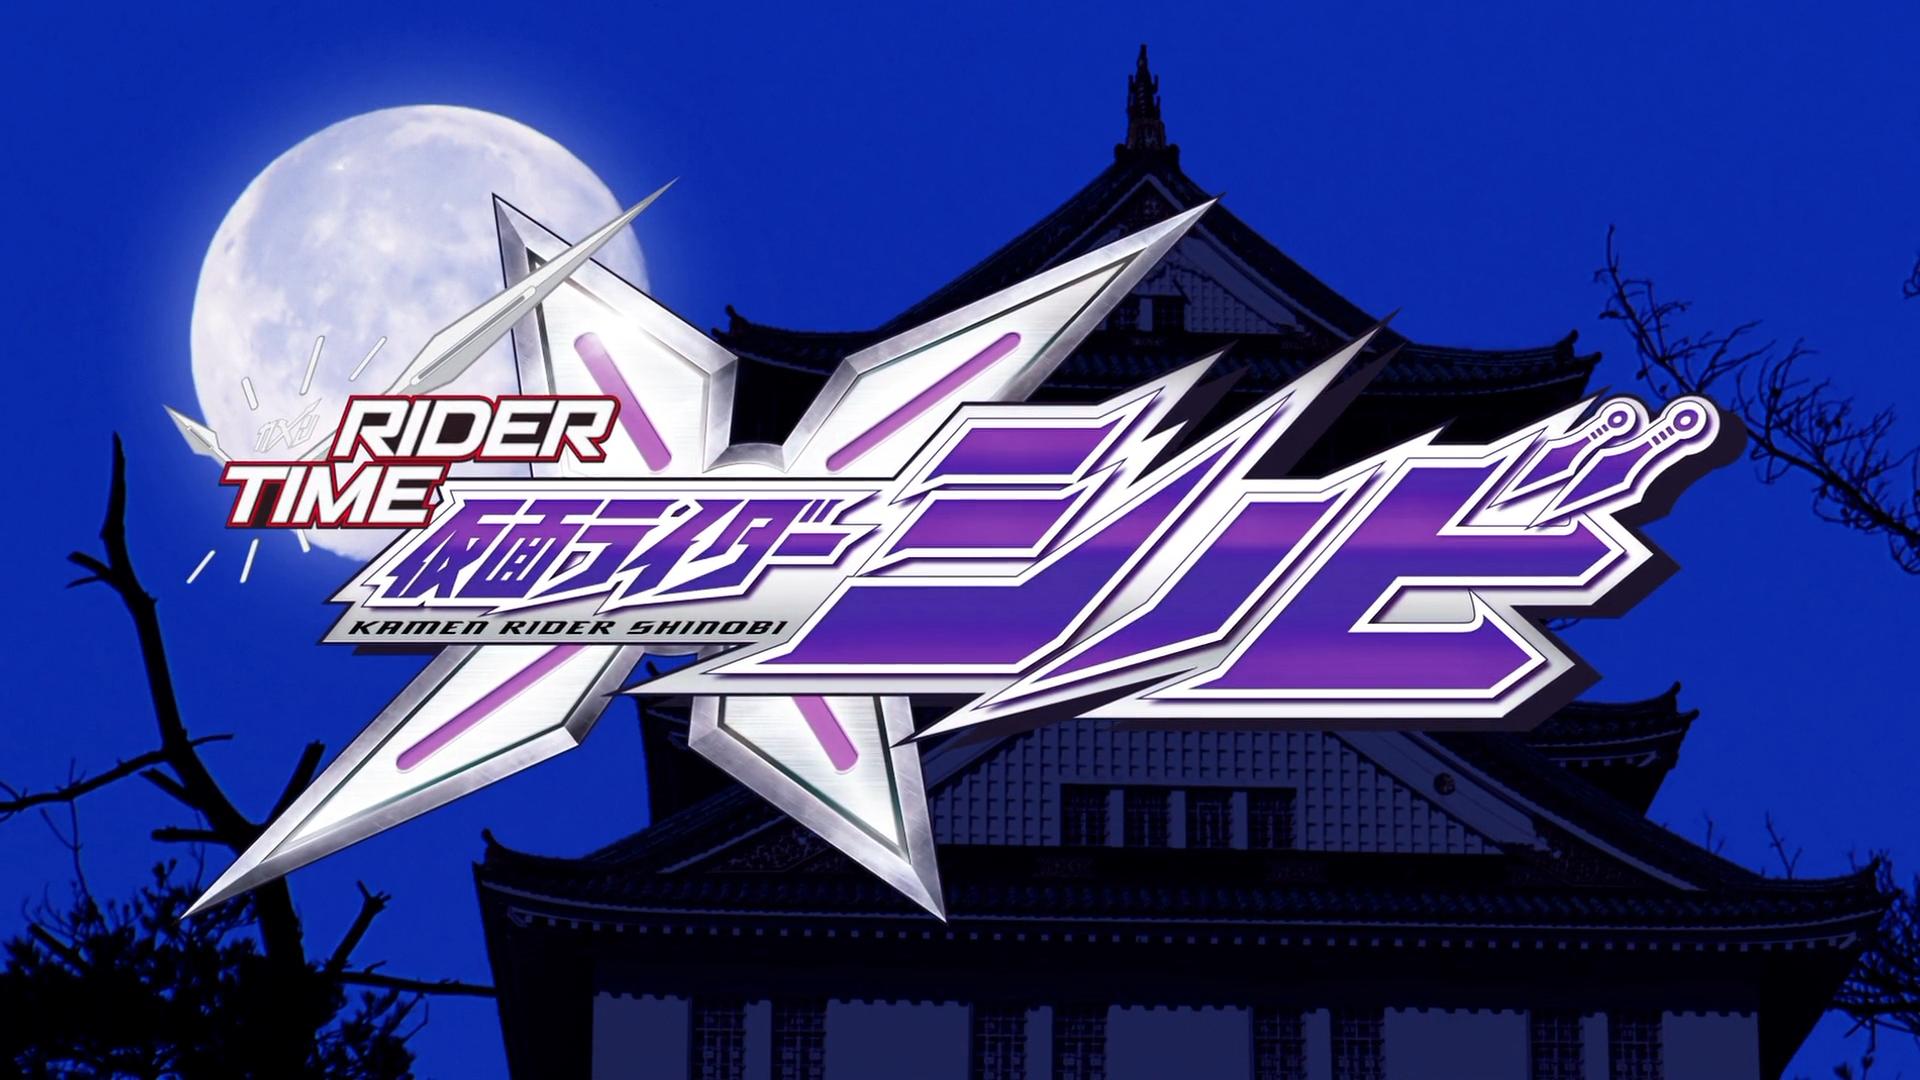 Rider Time: Kamen Rider Shinobi | Kamen Rider Wiki | Fandom